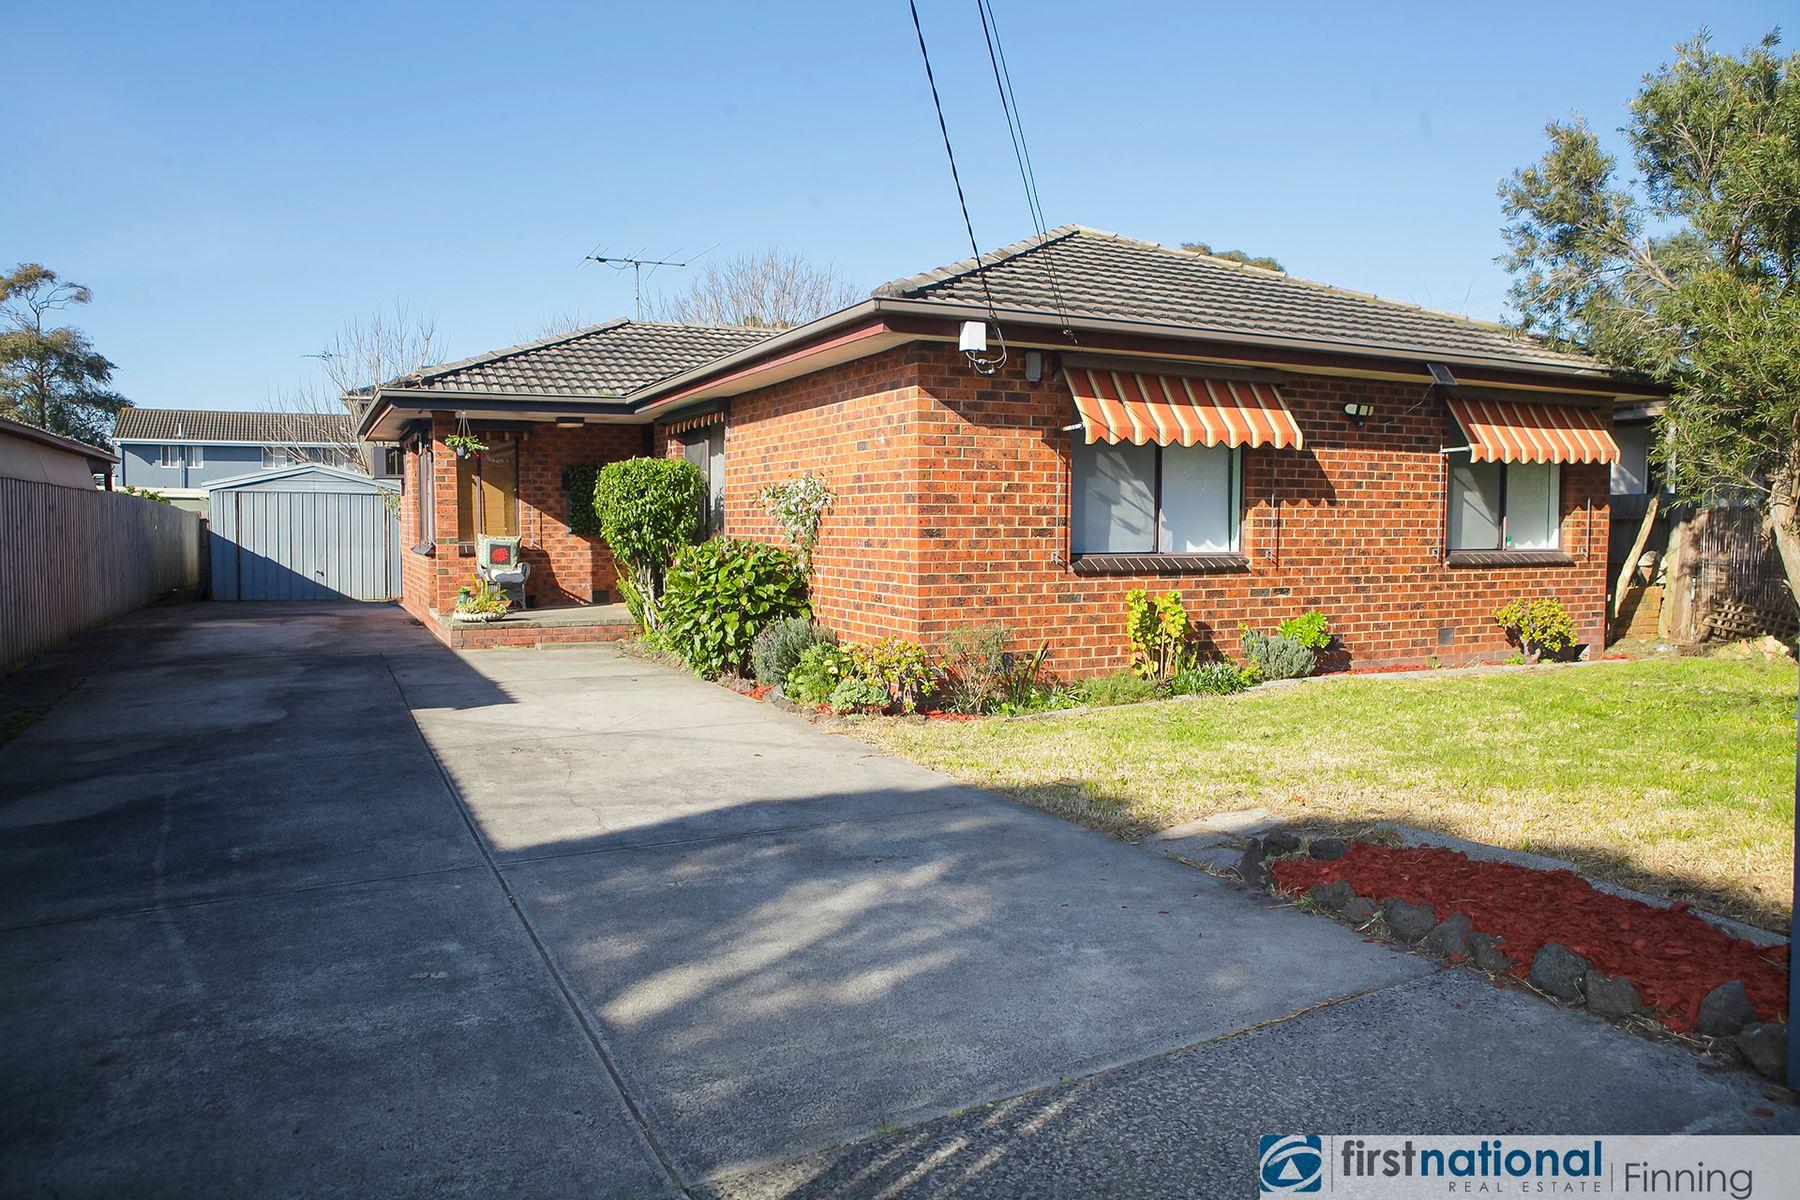 46 Hotham Street, Cranbourne, VIC 3977